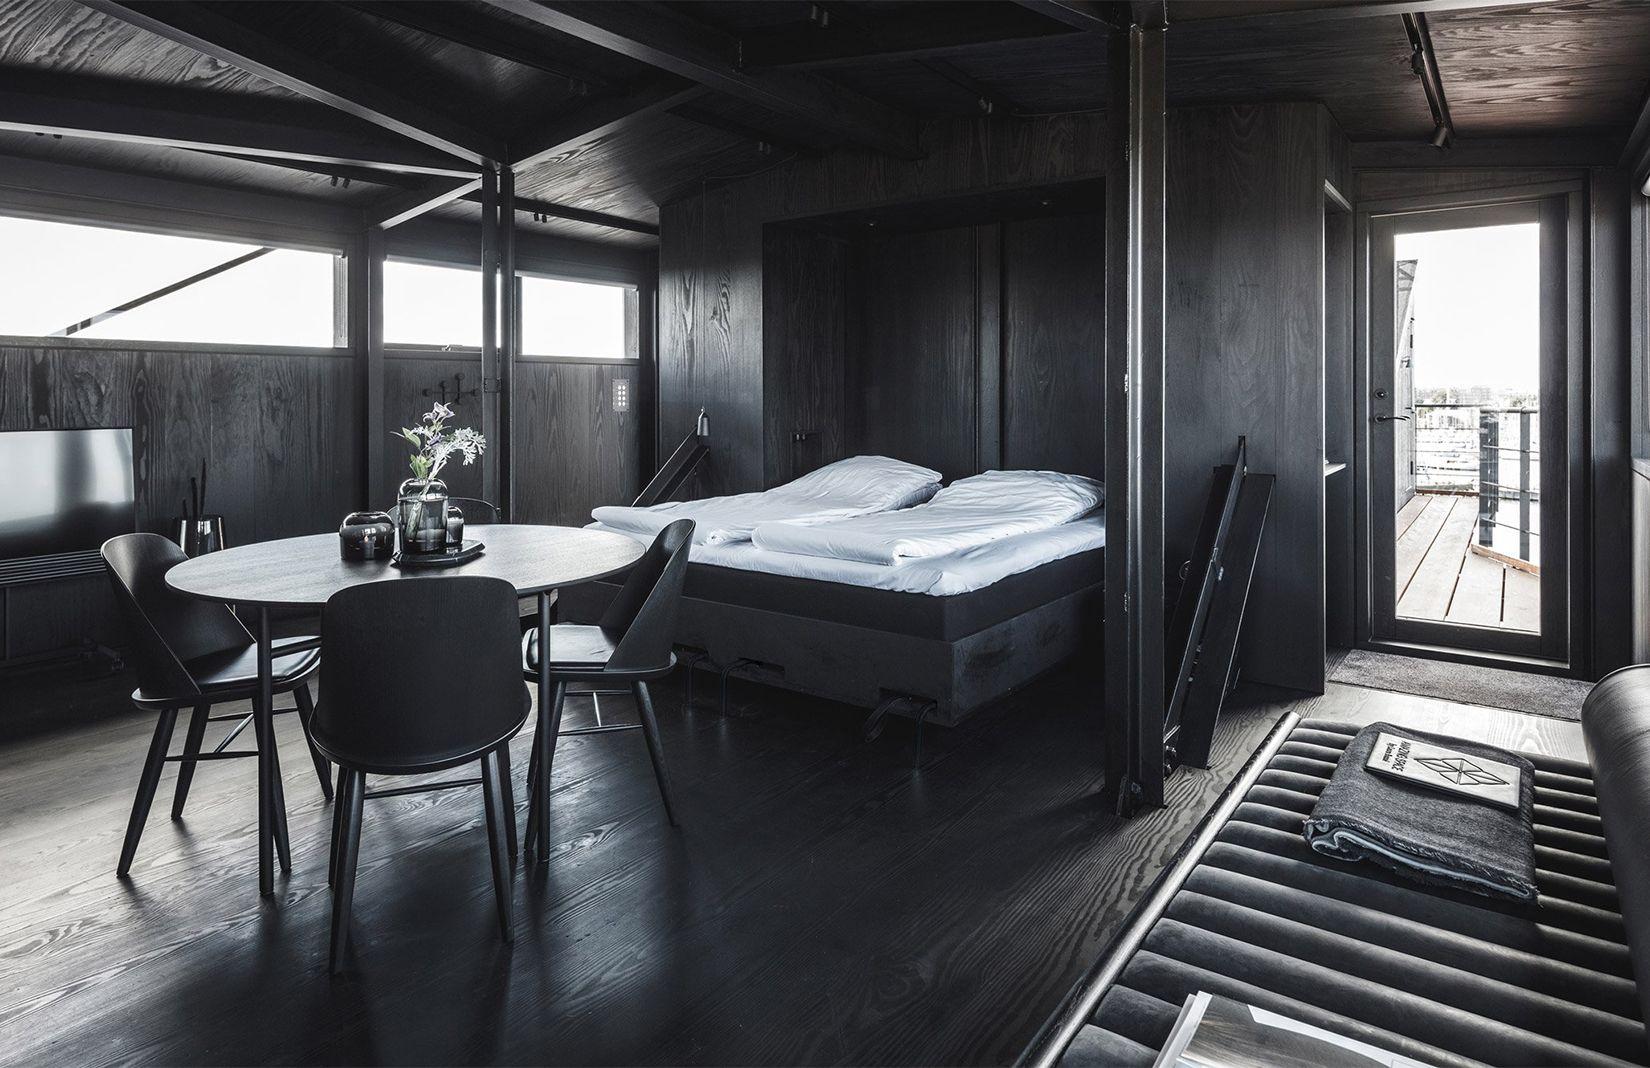 Copenhagen coal crane becomes a couples retreat and spa